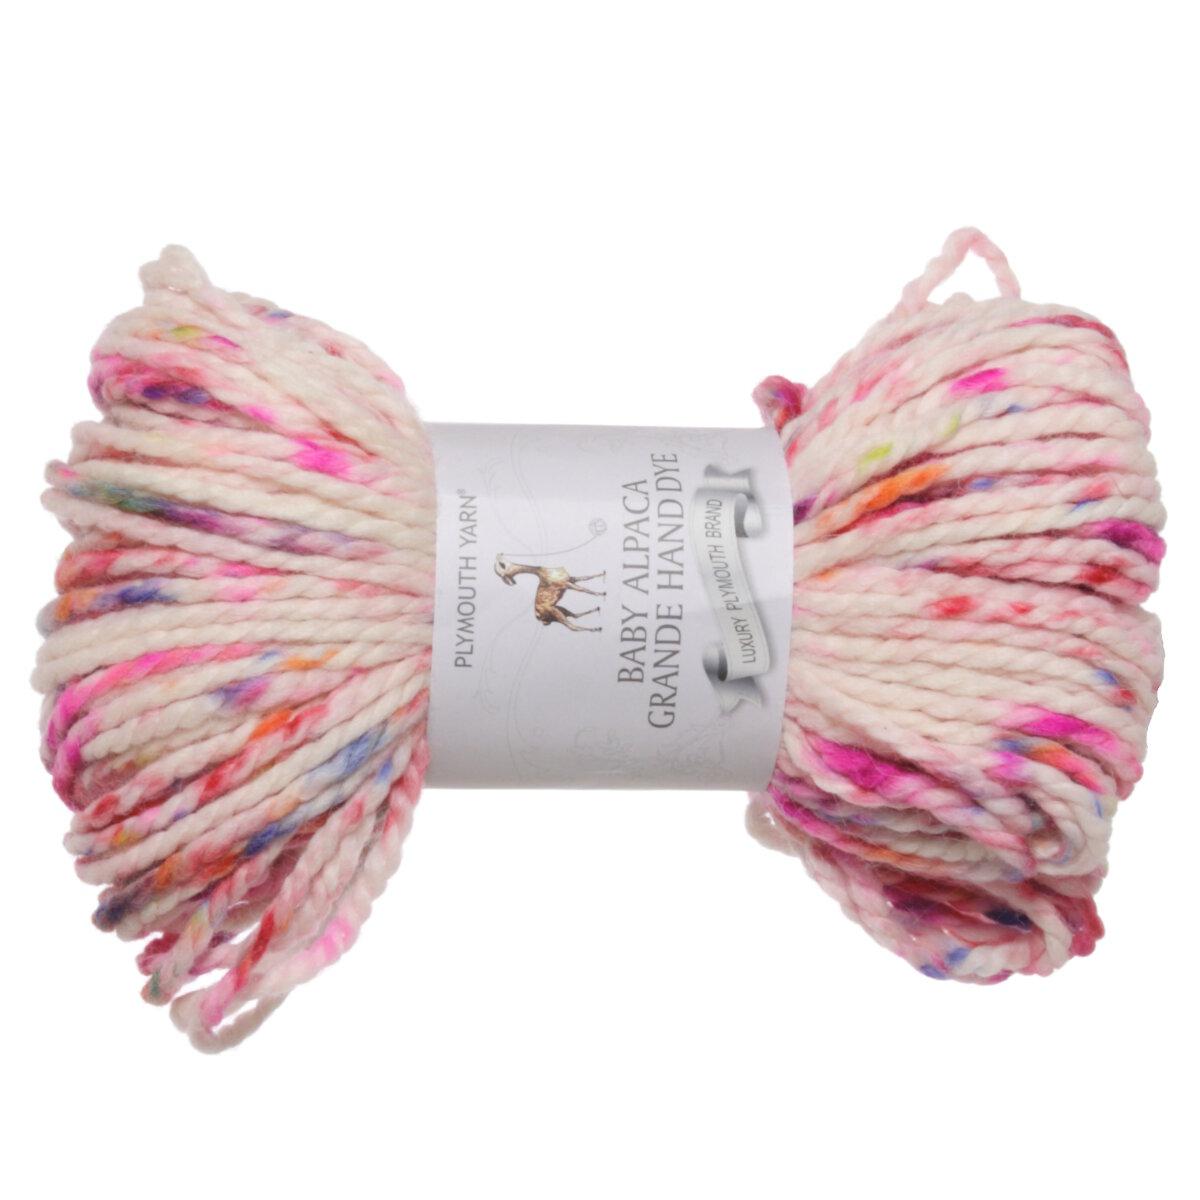 Plymouth Baby Alpaca Grande Hand Dye Yarn - 143 at Jimmy Beans Wool